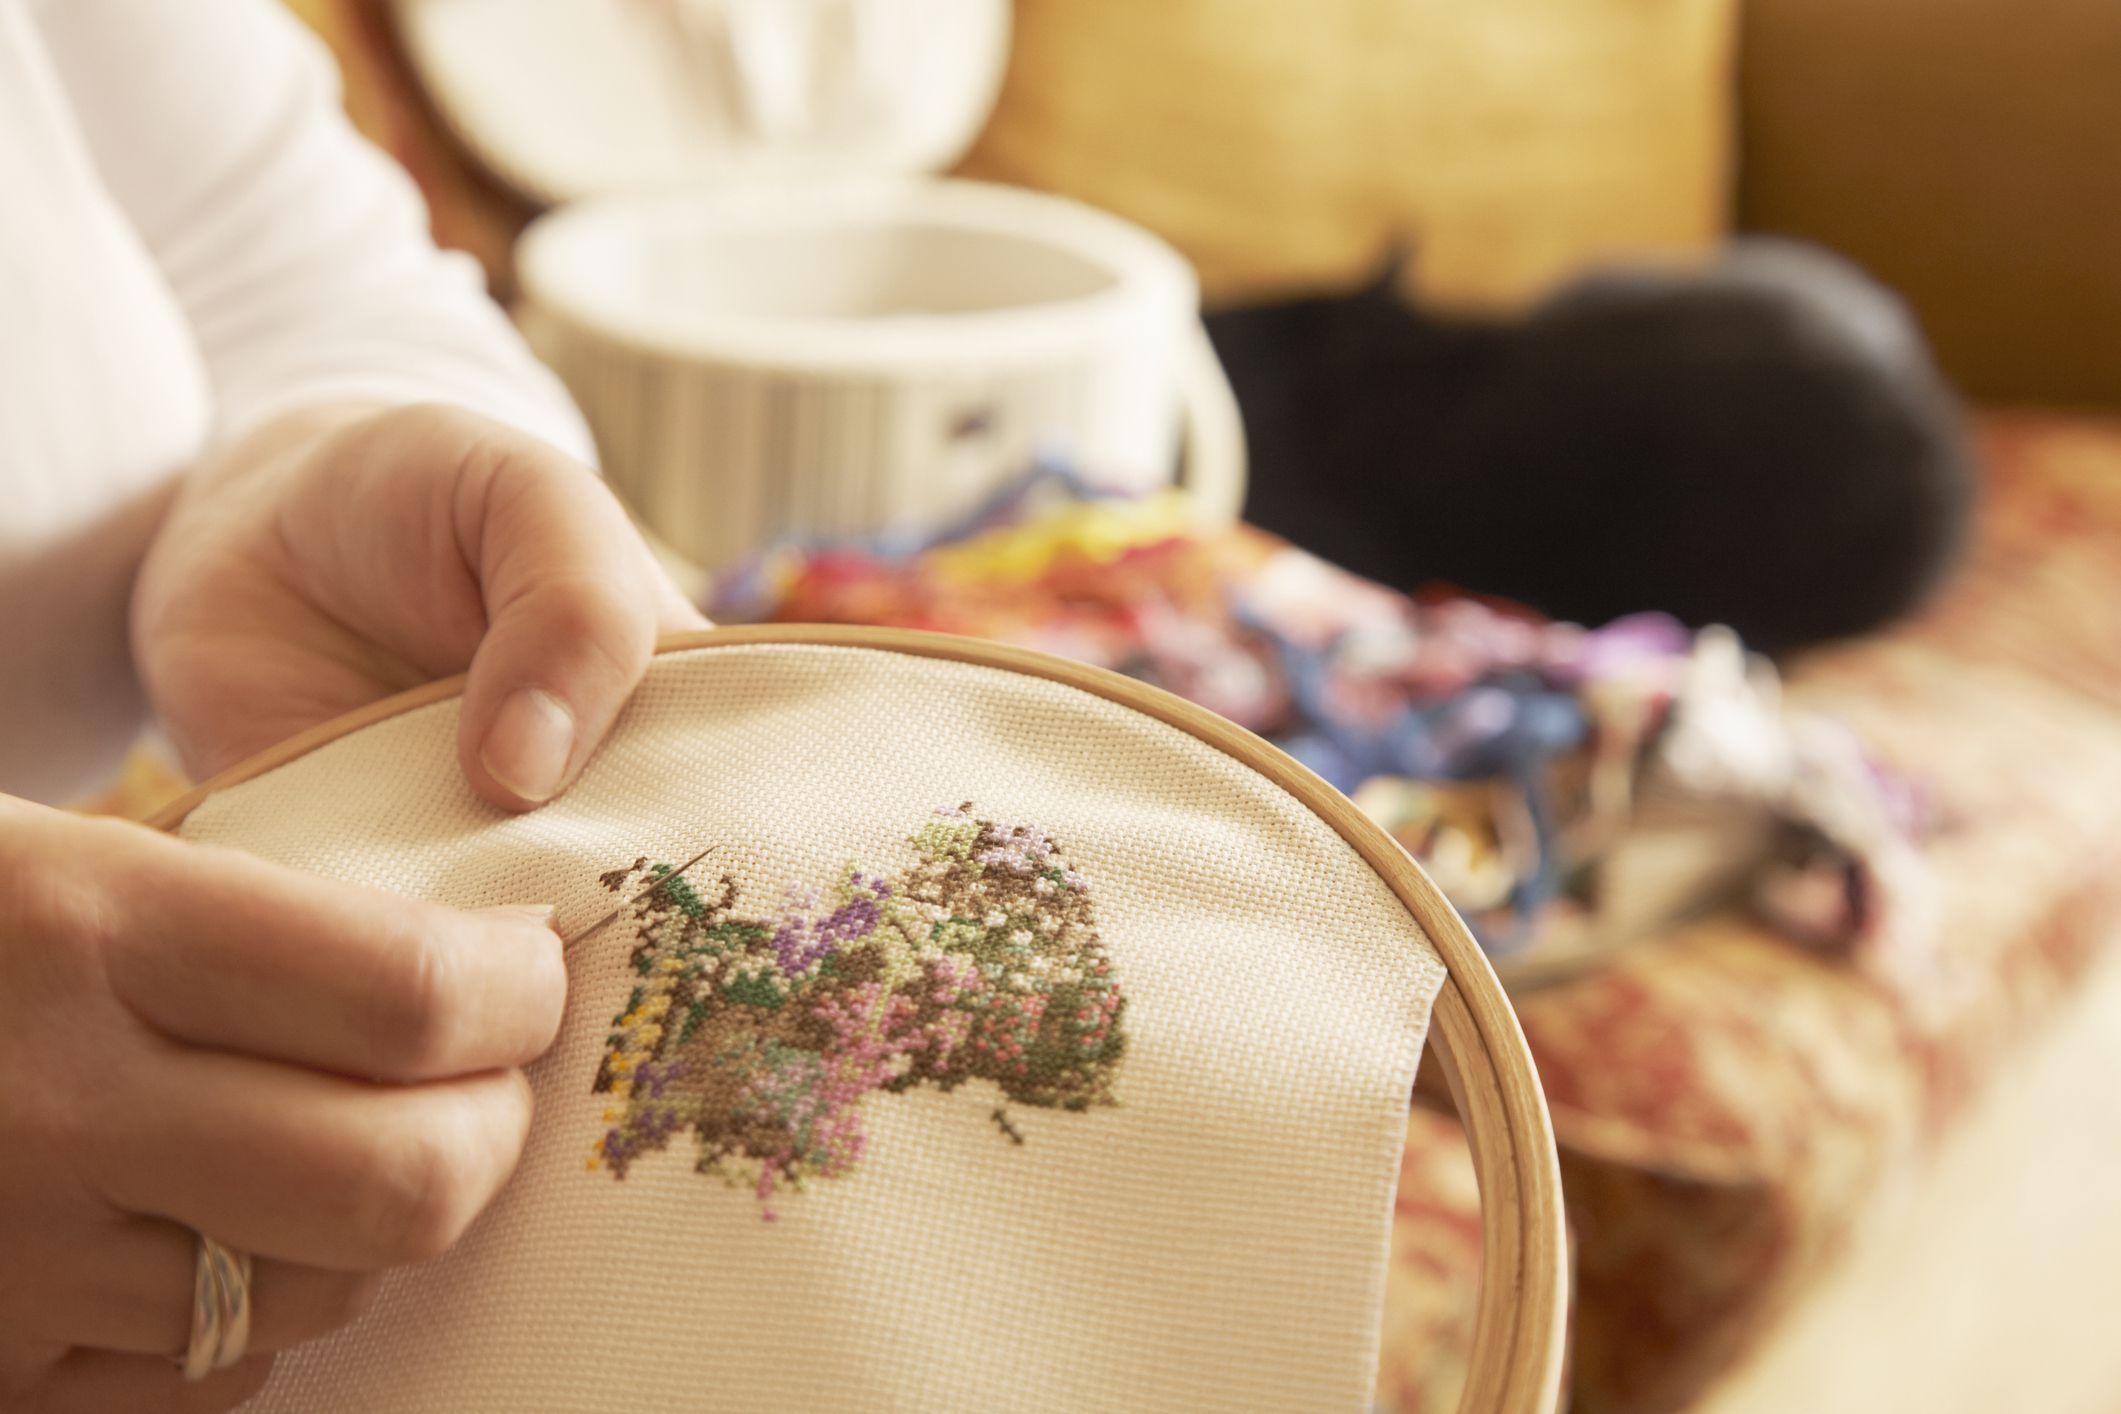 Learn to Cross Stitch: Five Basic Stitches in Cross Stitch